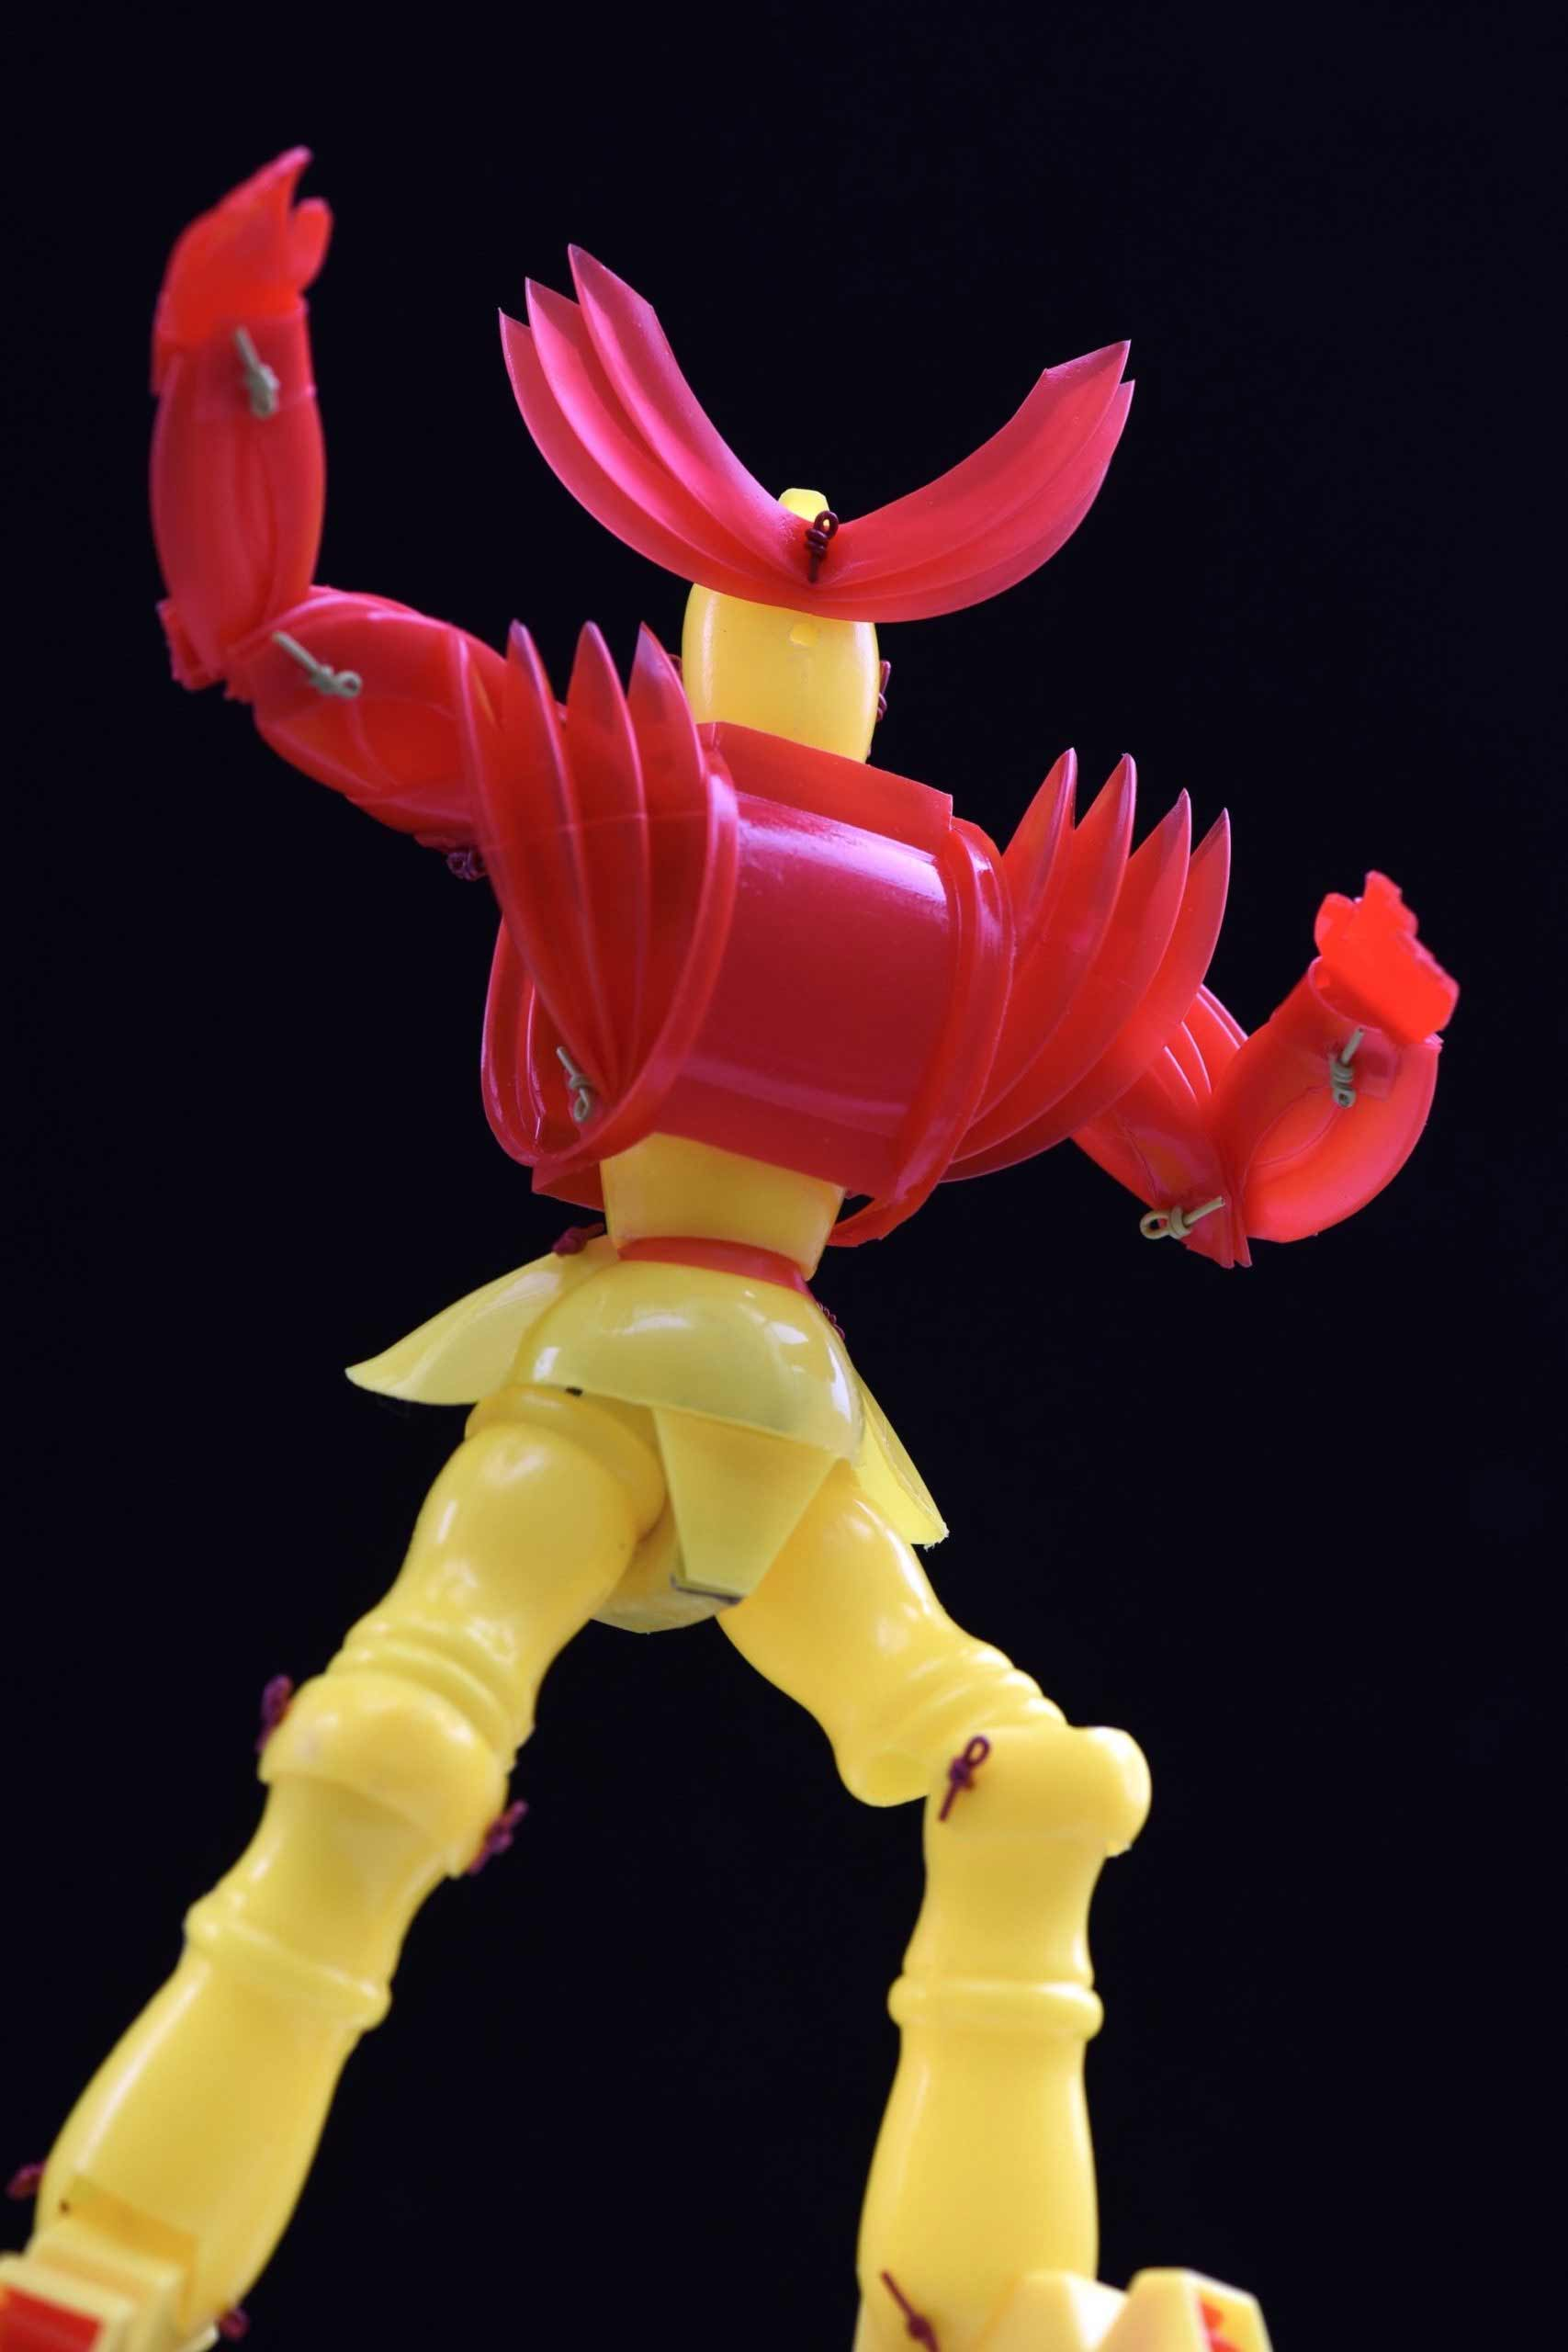 Quietscheentchen-Actionfigur quietscheentchen-actionfiguren-Tomohiro-Yasui_09